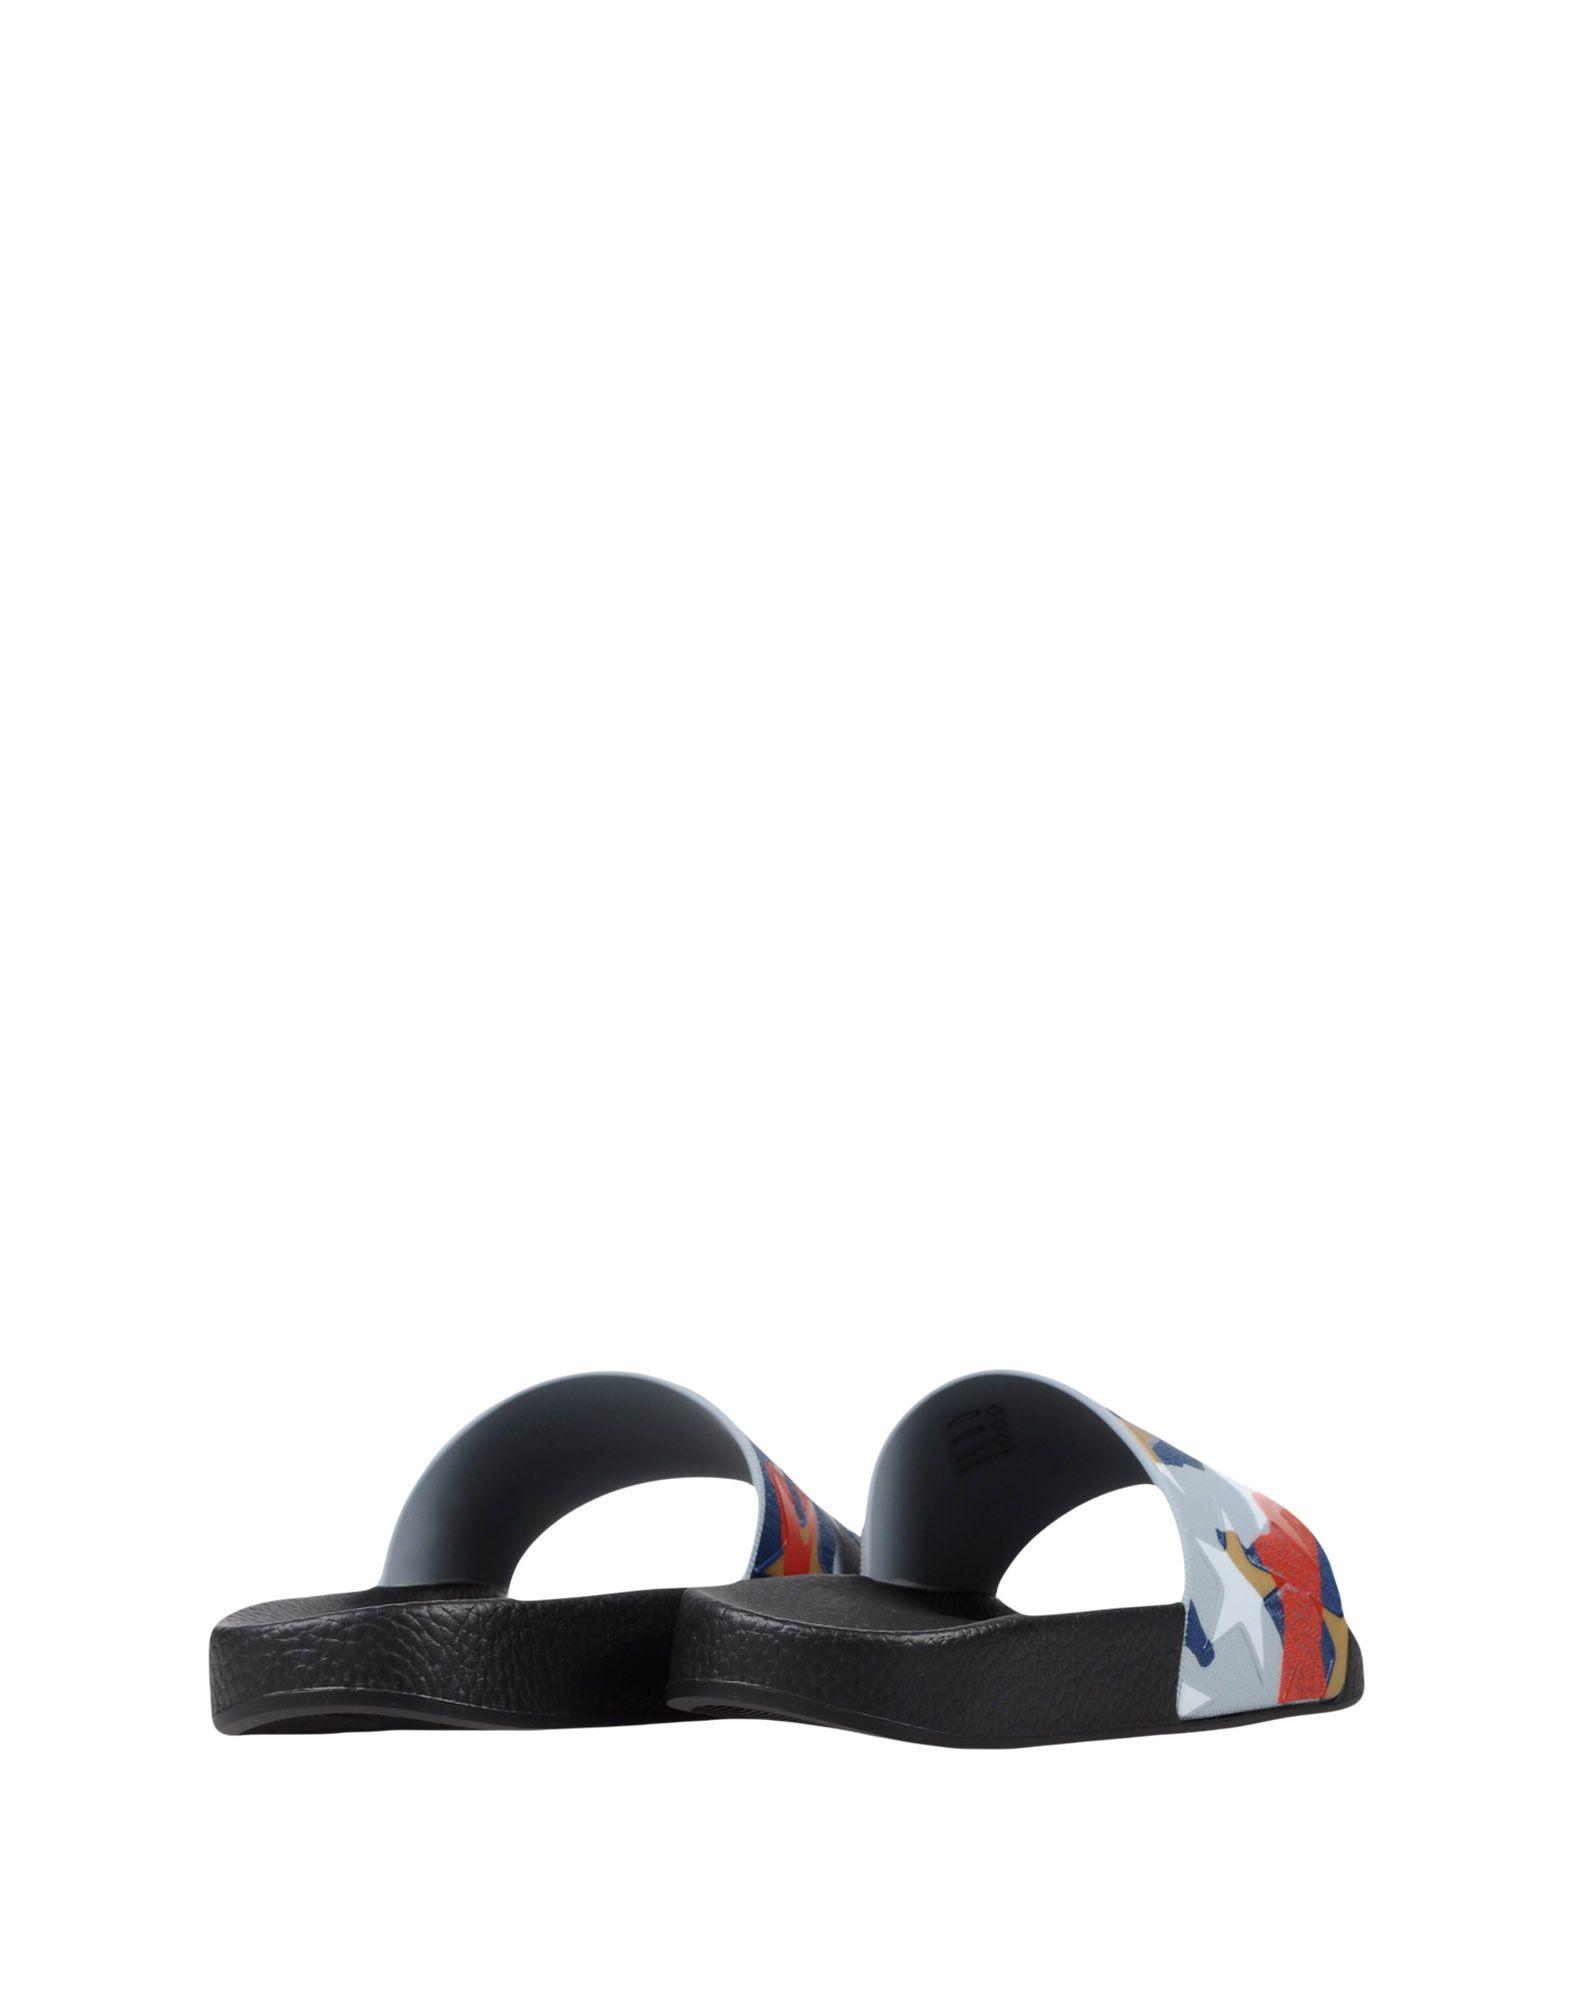 Valentino Garavani Garavani Garavani Sandals - Men Valentino Garavani Sandals online on  Australia - 11381645BD ff5db3